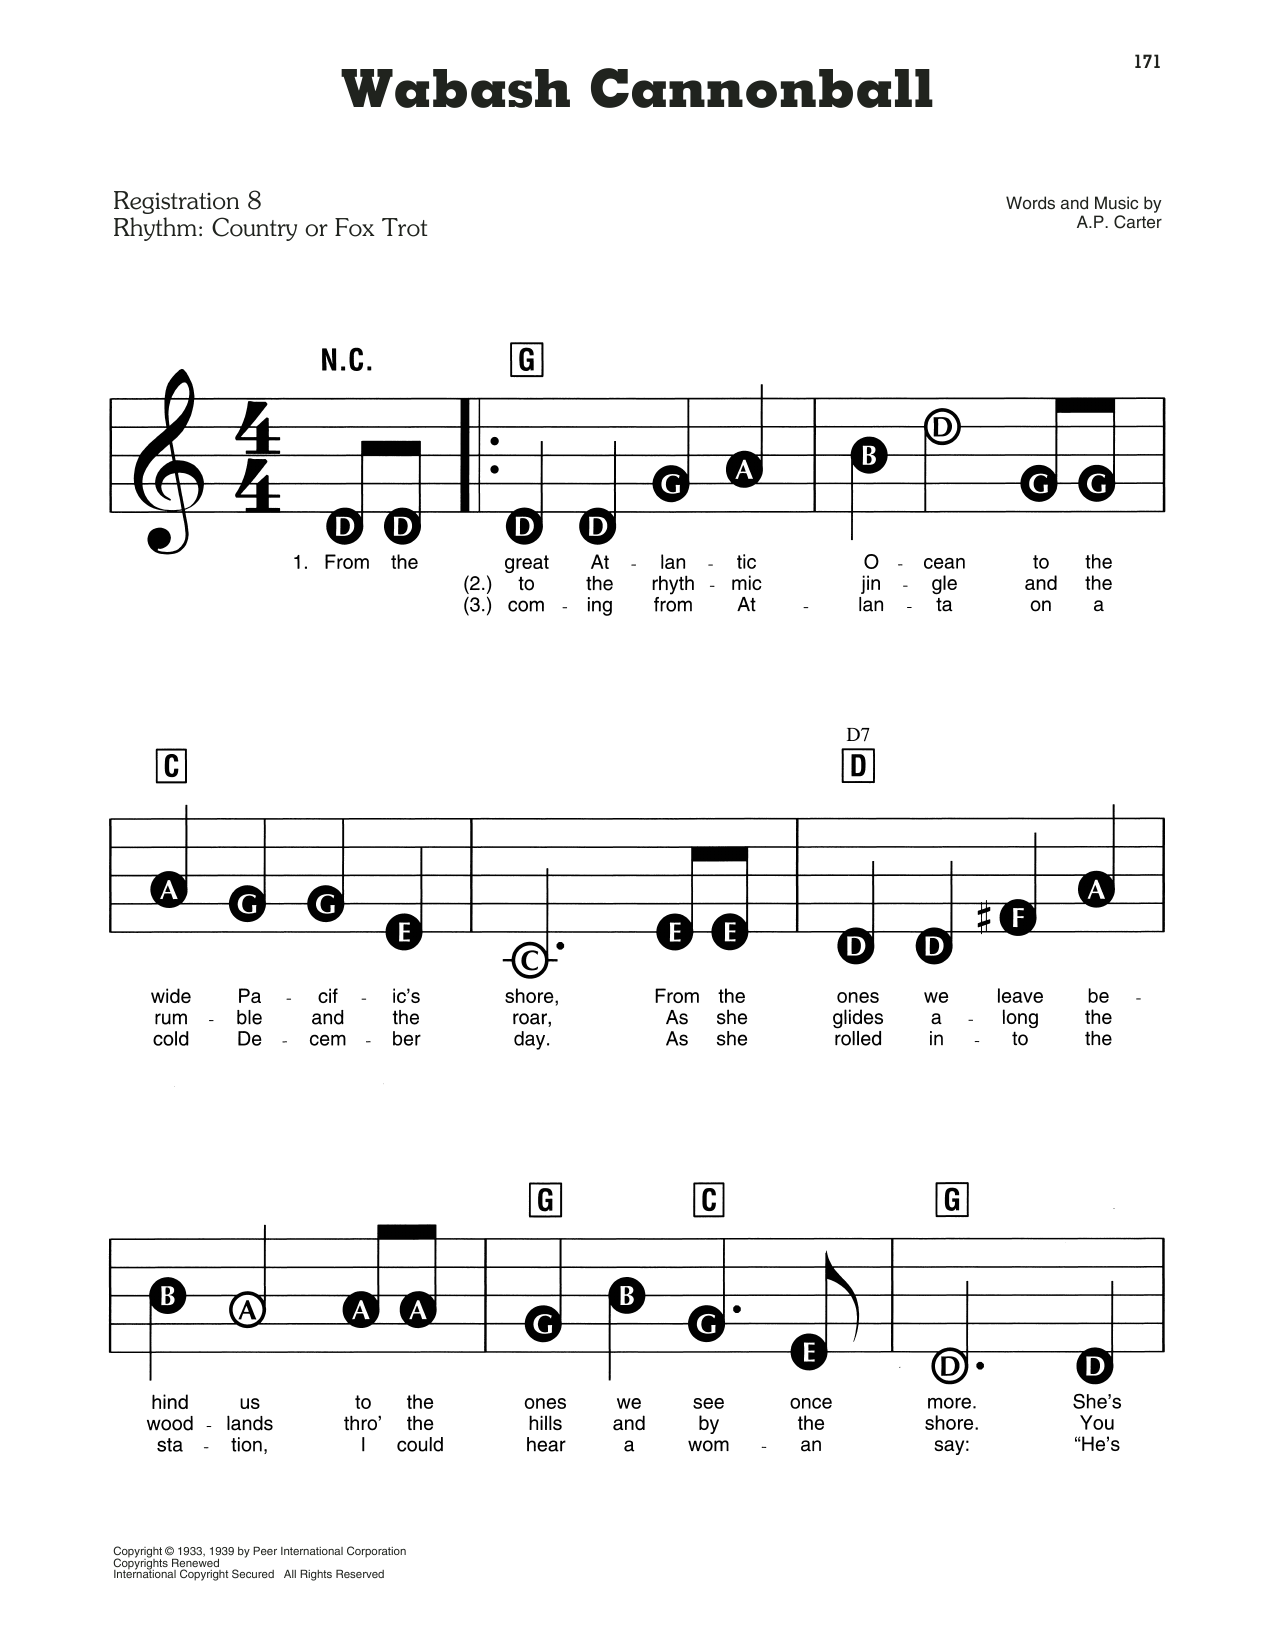 Wabash Cannonball Sheet Music